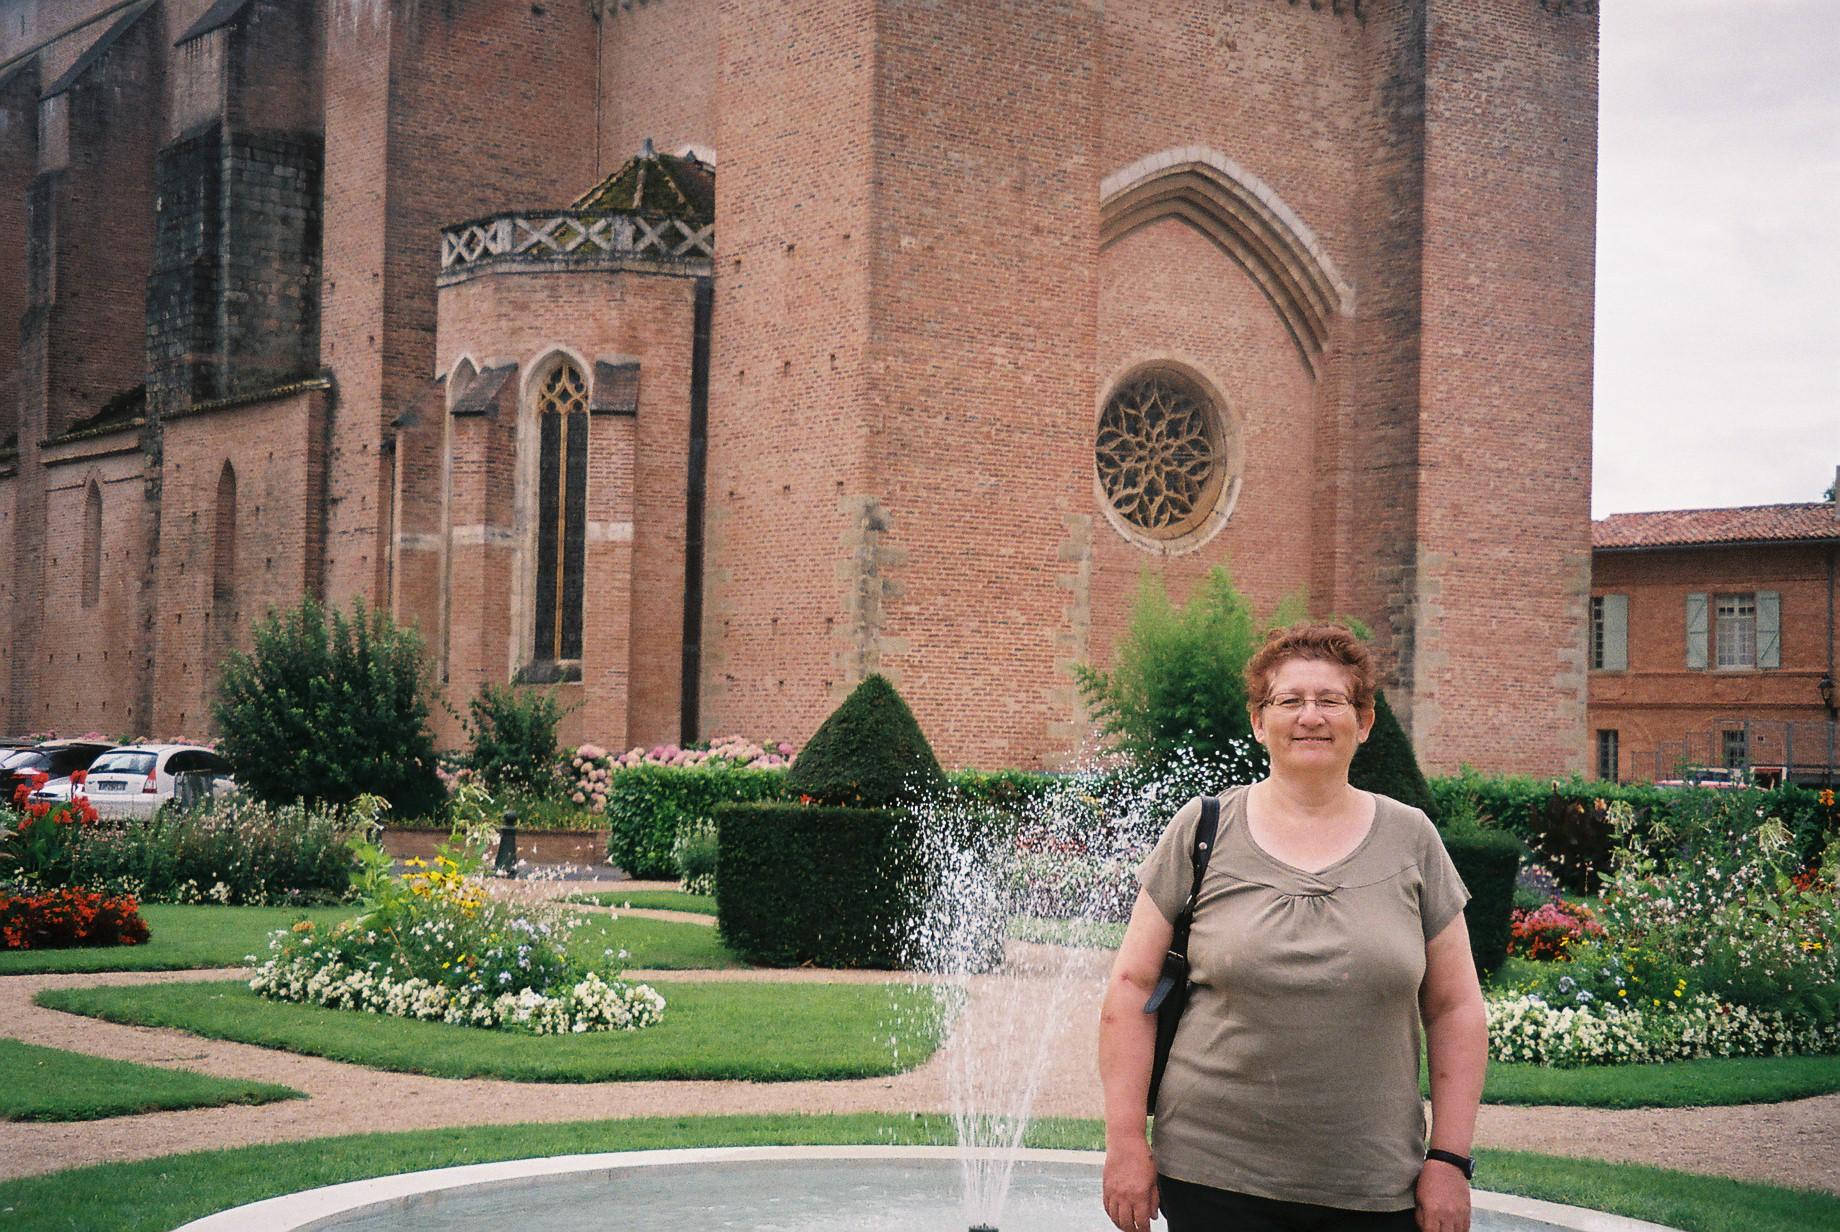 lavaur-cathedral-gardens-MF jul10